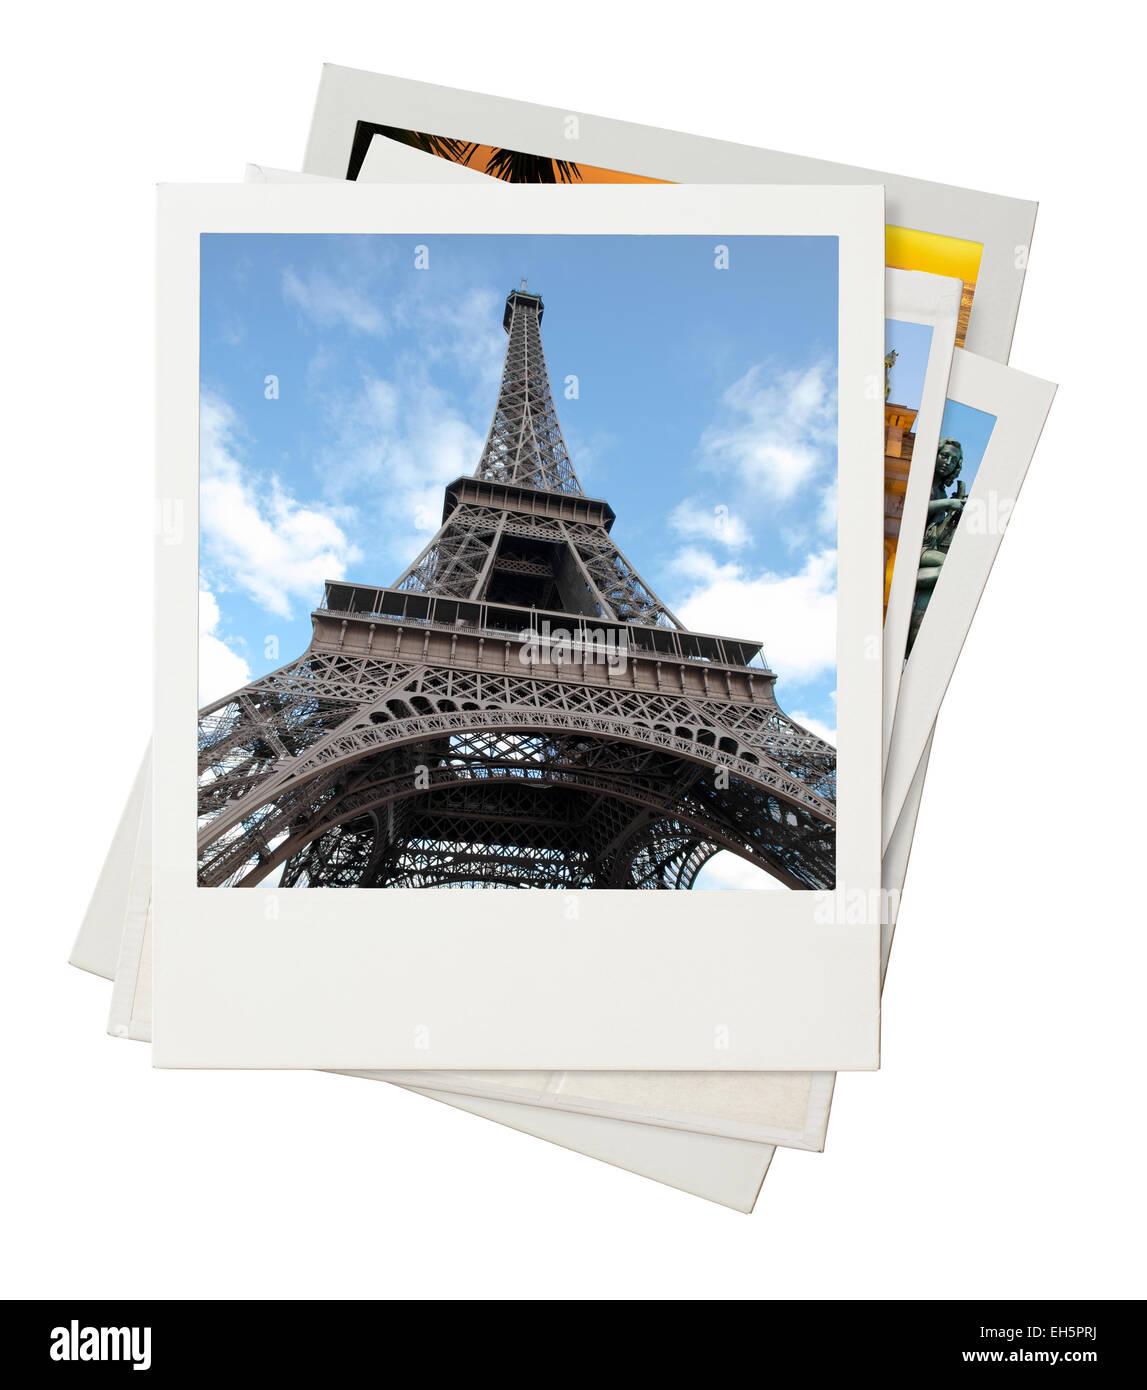 Montage photo voyage isolé sur fond blanc Photo Stock